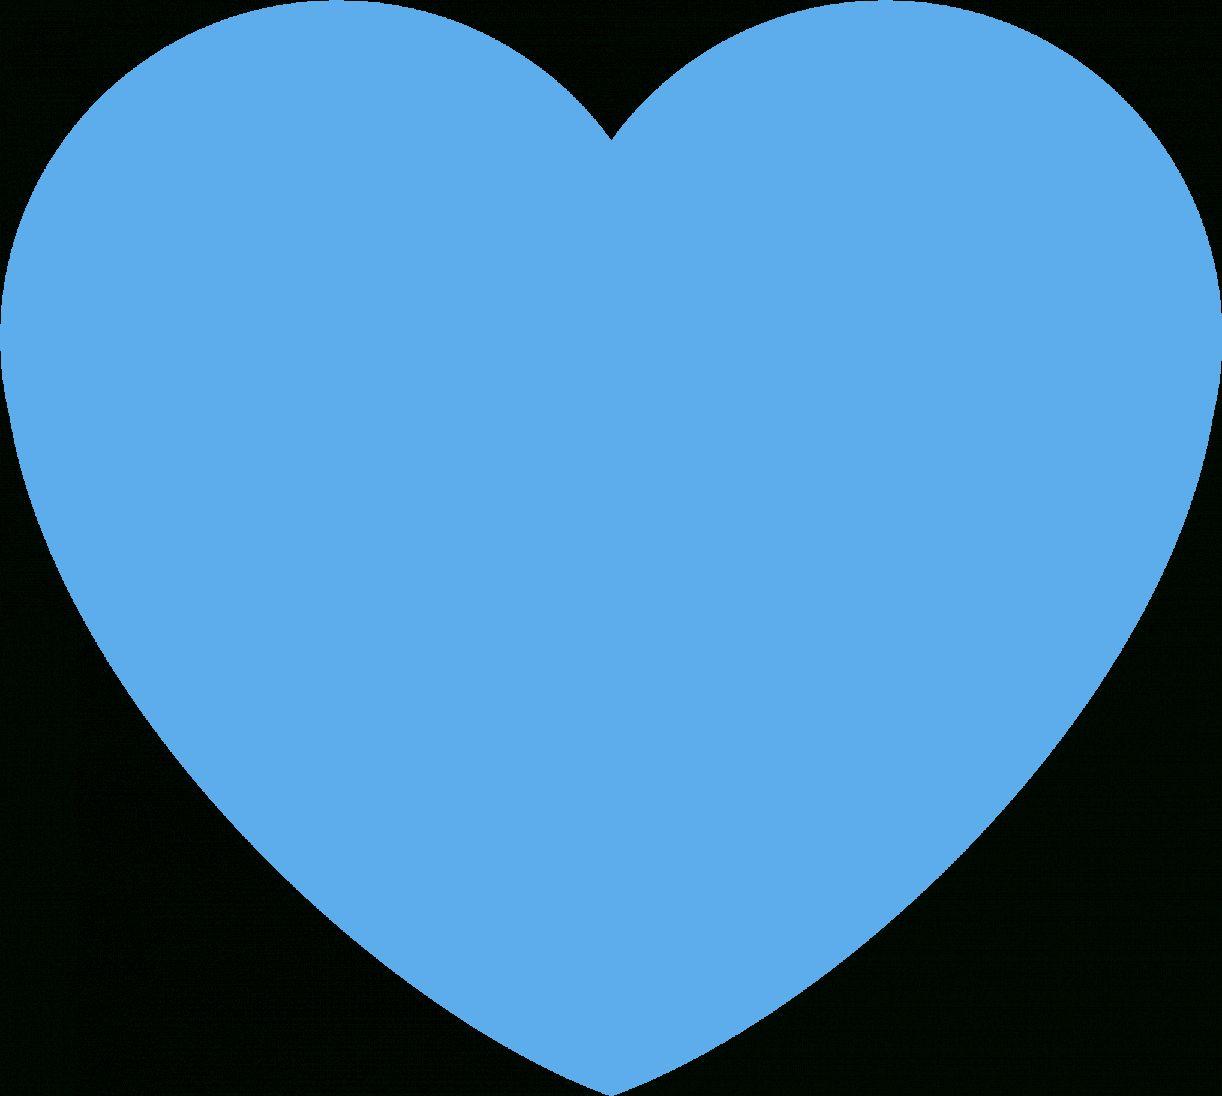 15 Blue Heart Png Blue Heart Emoji Blue Heart Heart Illustration